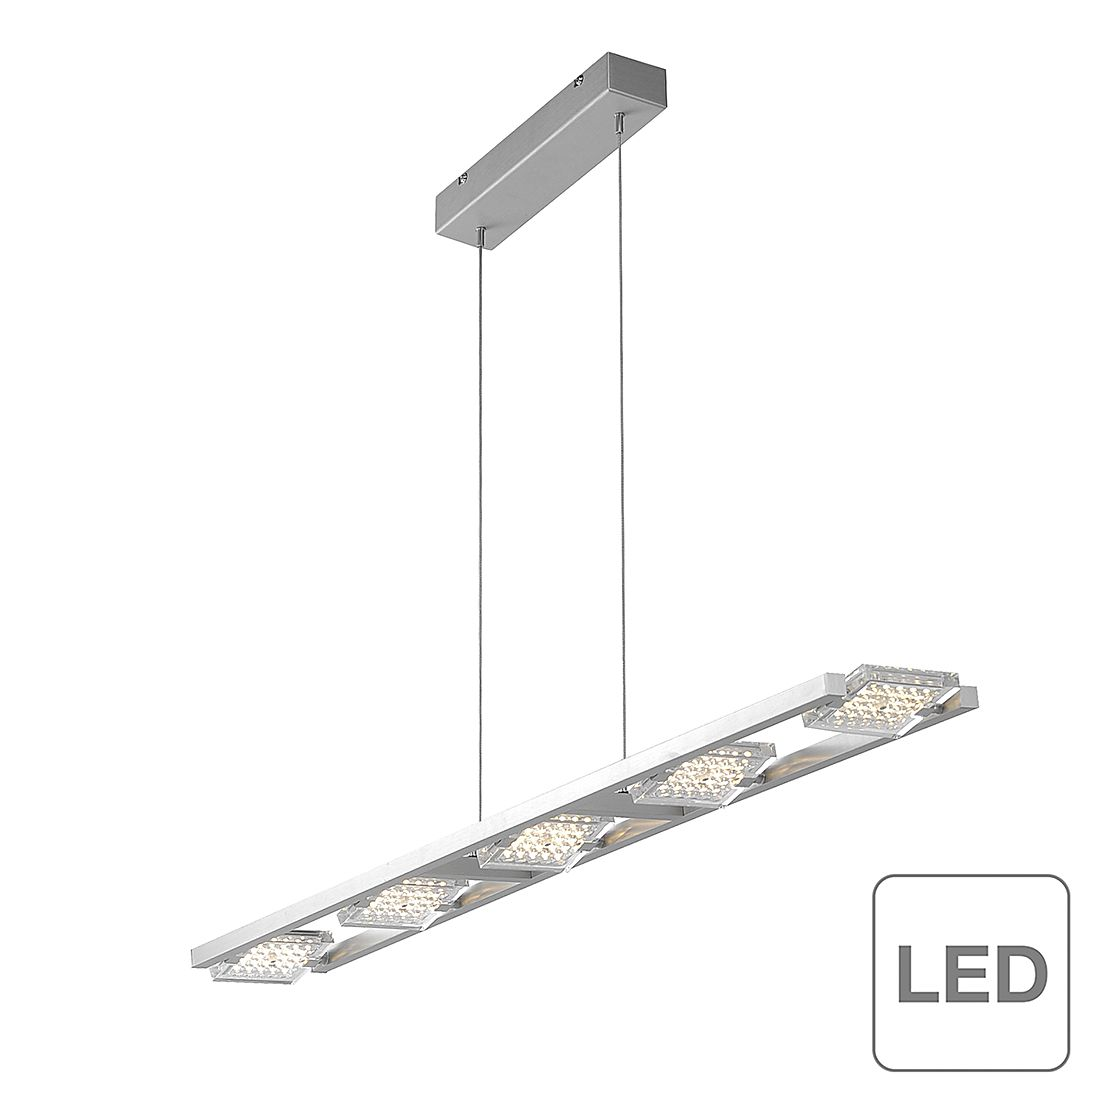 EEK A+, LED-Pendelleuchte Futura - Metall/ Glas - Silber, Paul Neuhaus